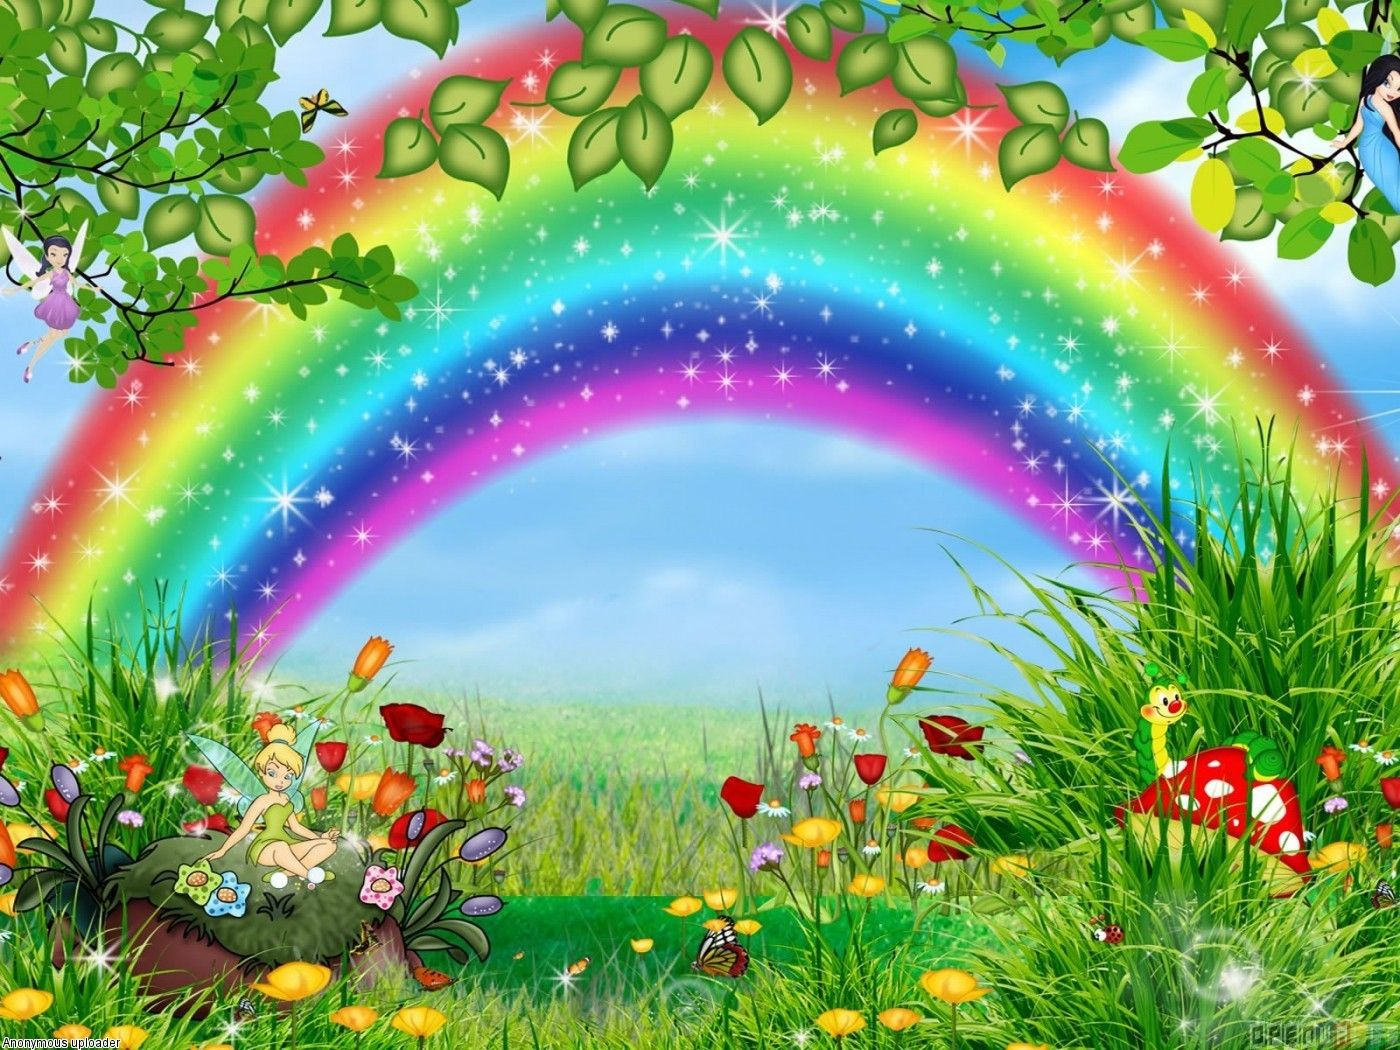 Tinkerbell Vector Disney Tinkerbell Cartoon Wallpaper 6061 Open Walls In 2020 Rainbow Wallpaper Rainbow Art Beautiful Wallpapers